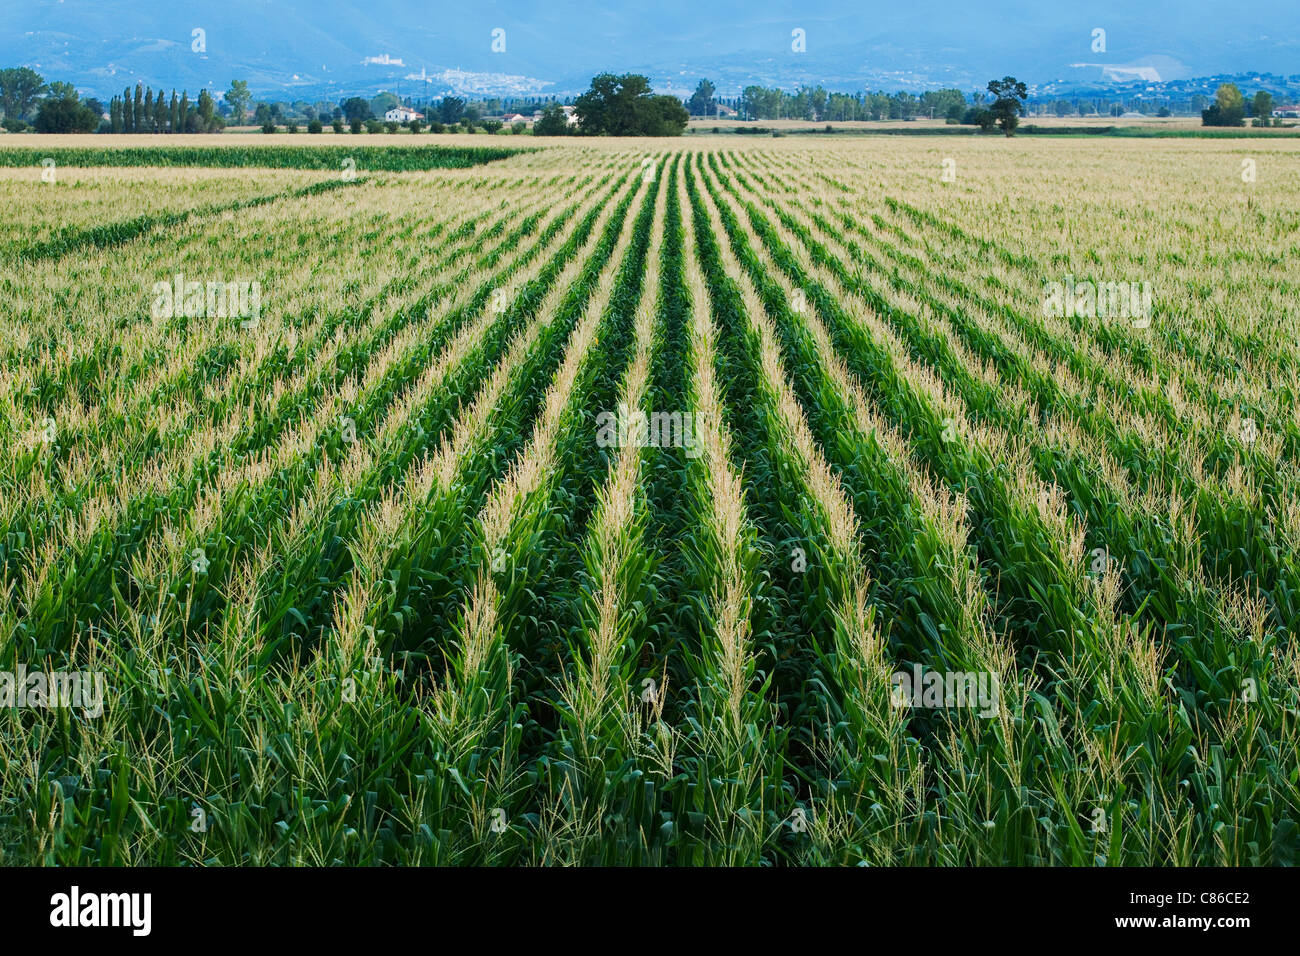 Le maïs / maïs - Toscane - Italie Photo Stock